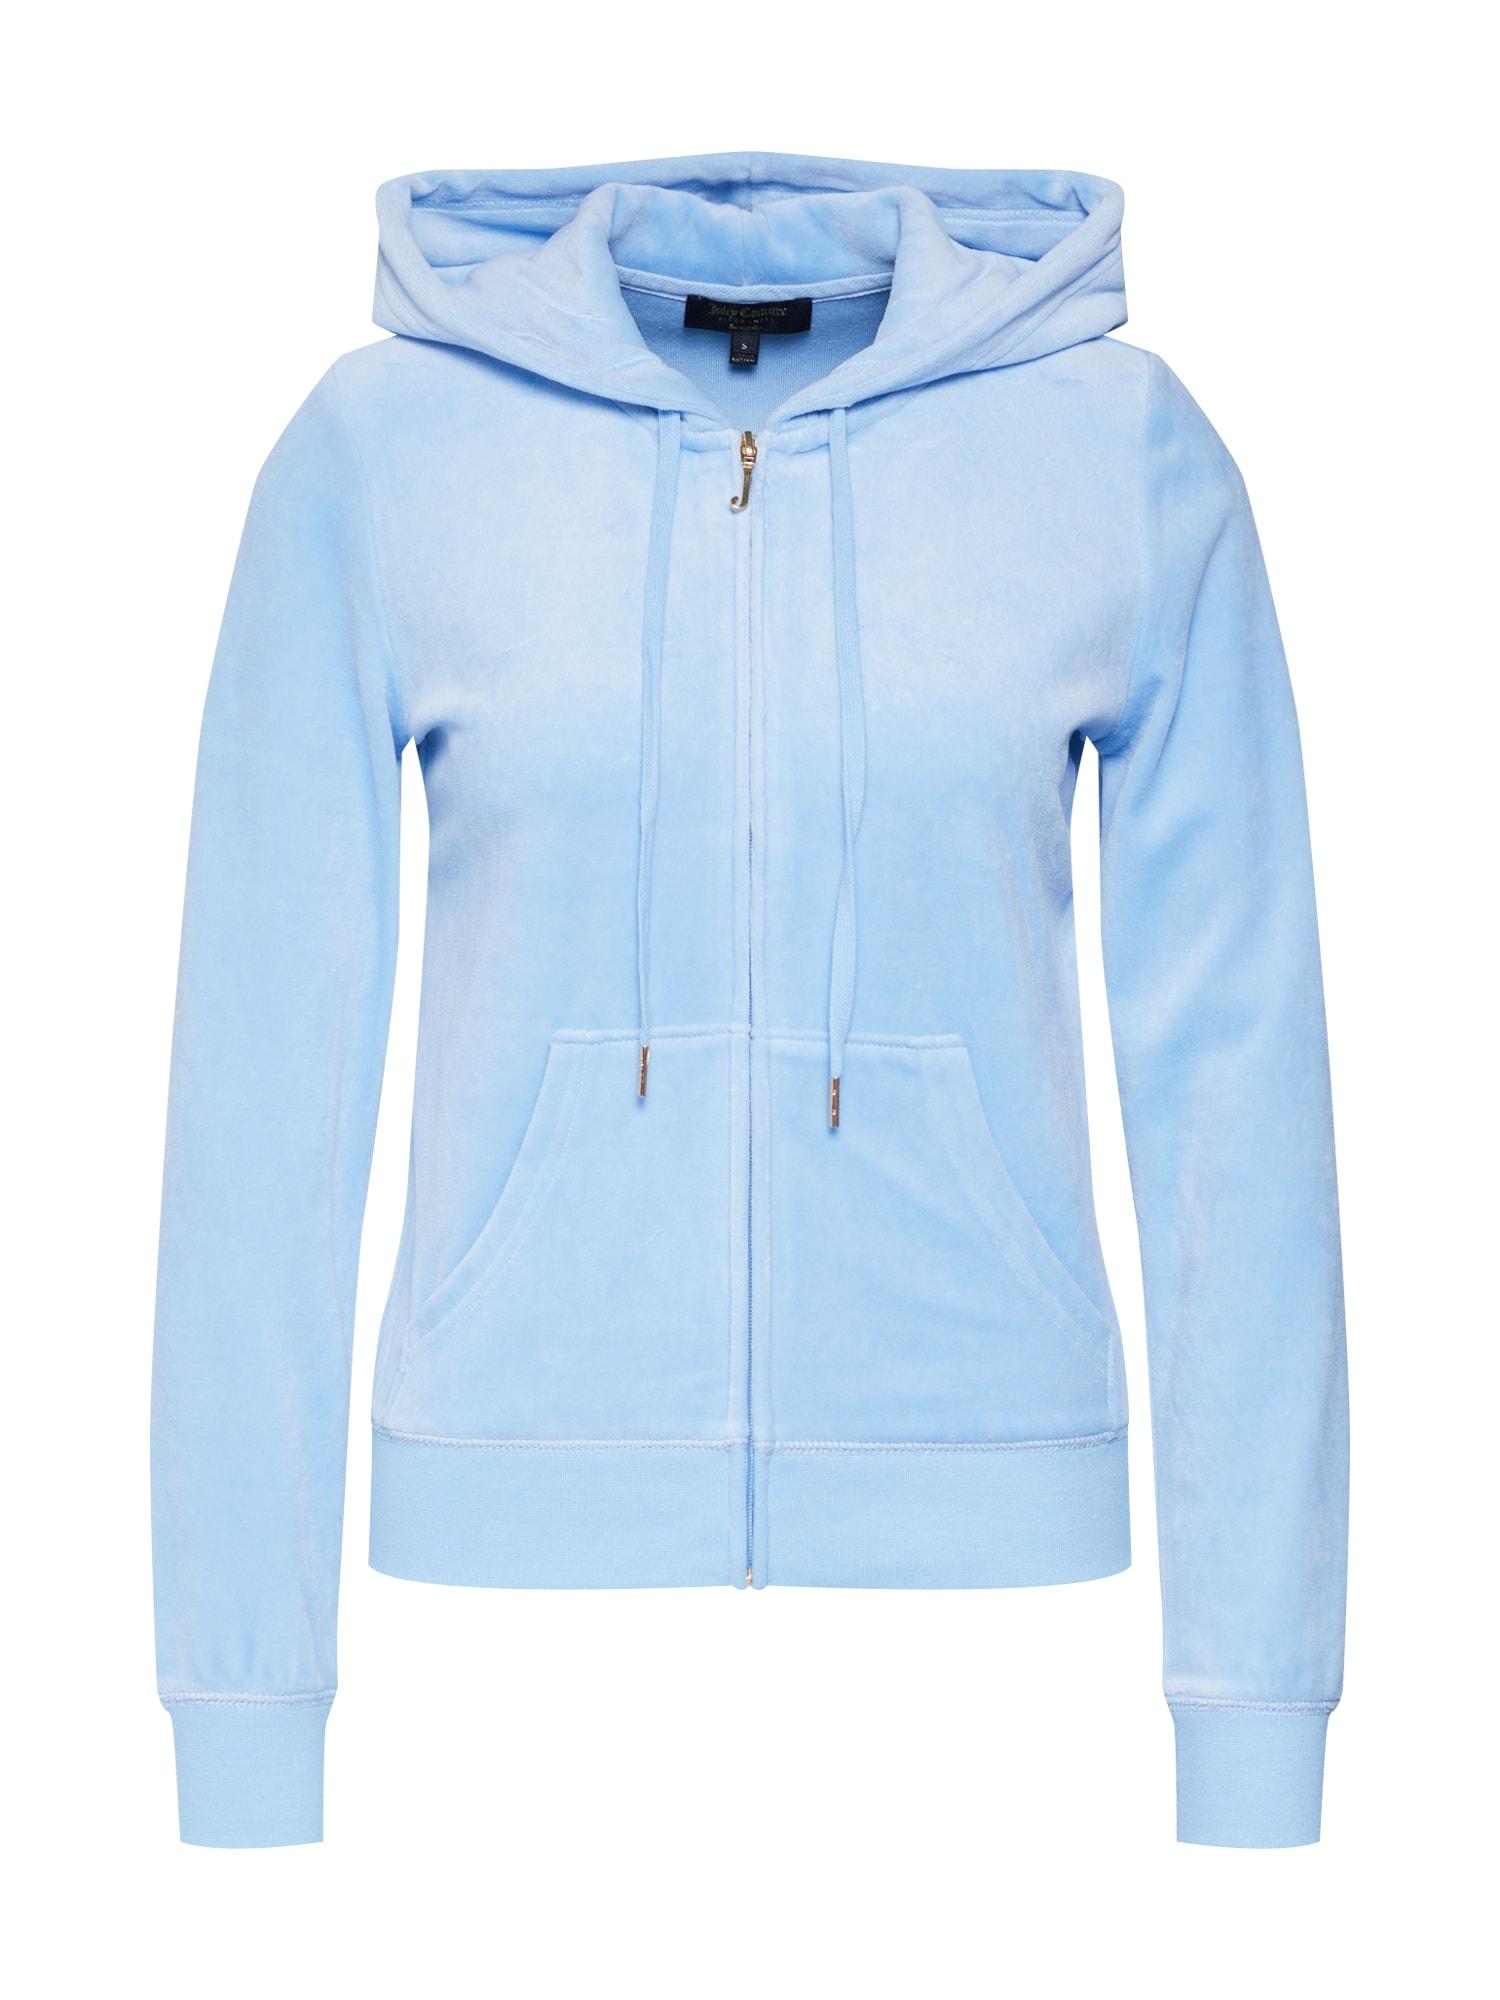 Mikina s kapucí JUICY CAMEO VELOUR ROBERTSON JACKET modrá Juicy Couture Black Label